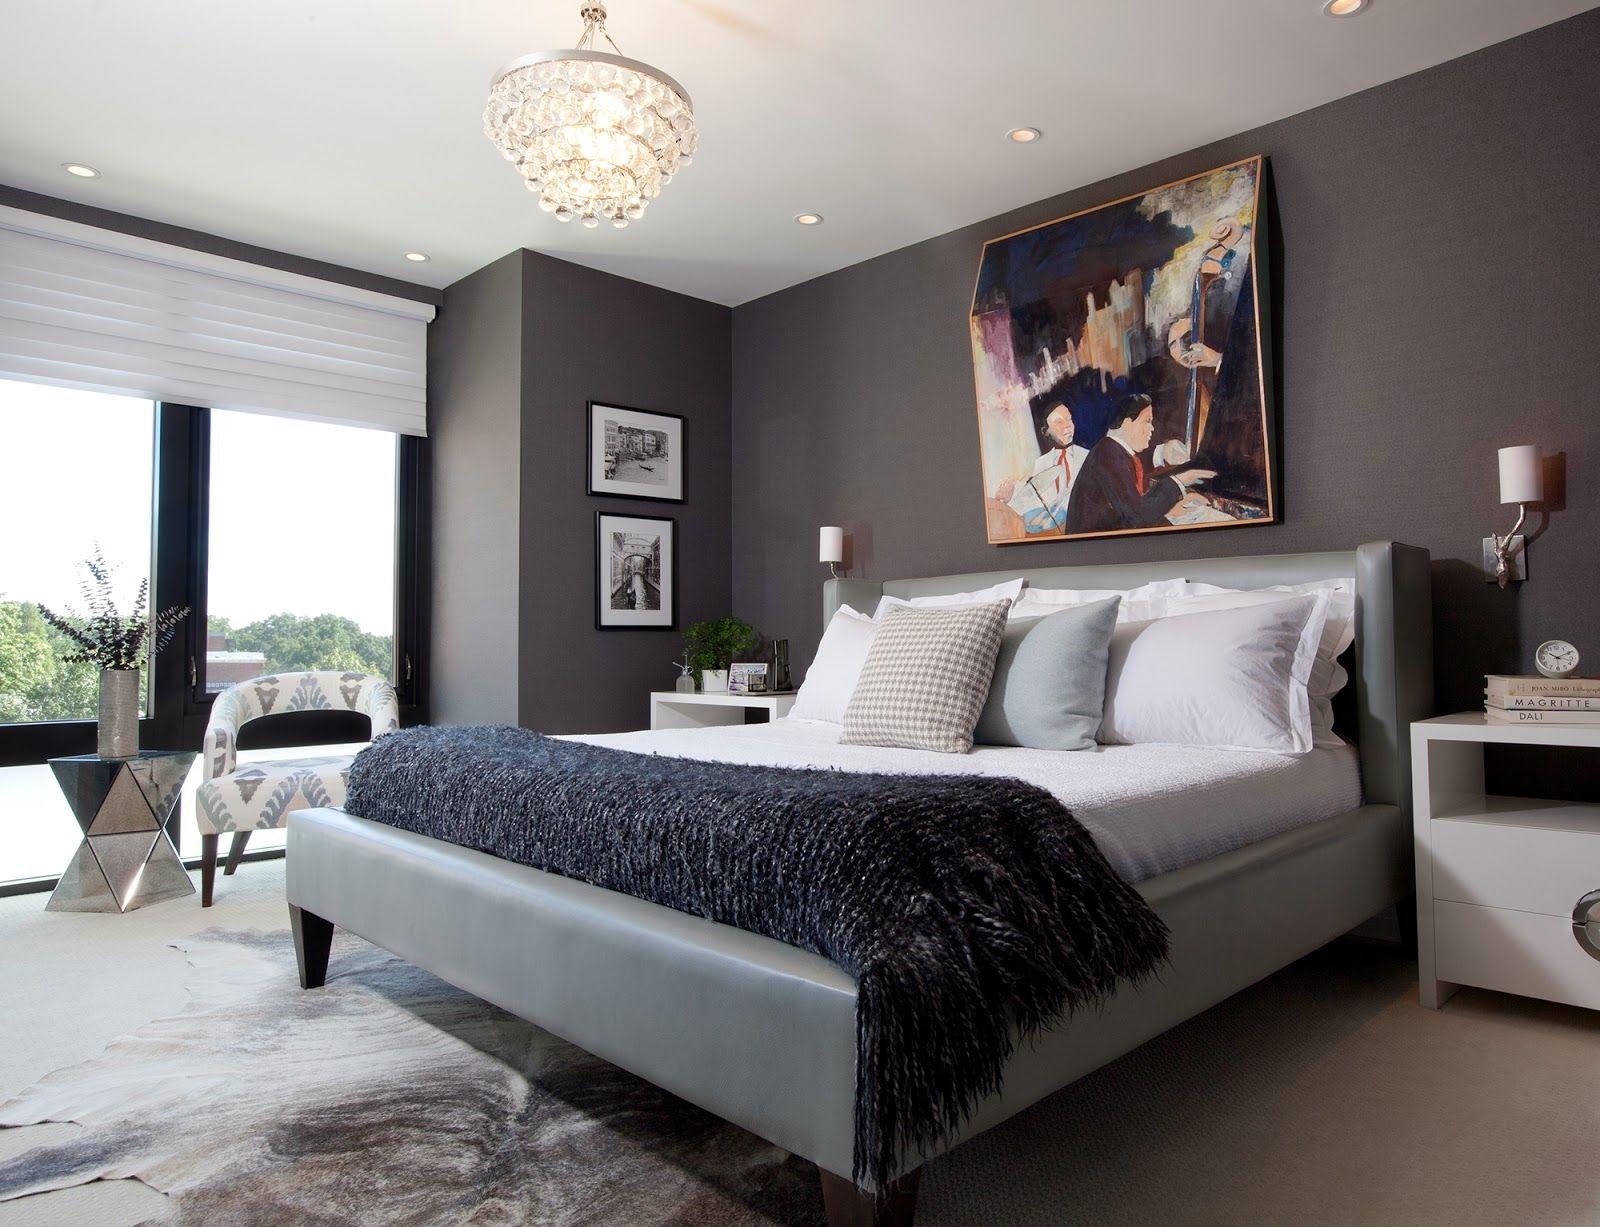 Man bedrooms ideas | Home Idea | Pinterest | Bedroom ...